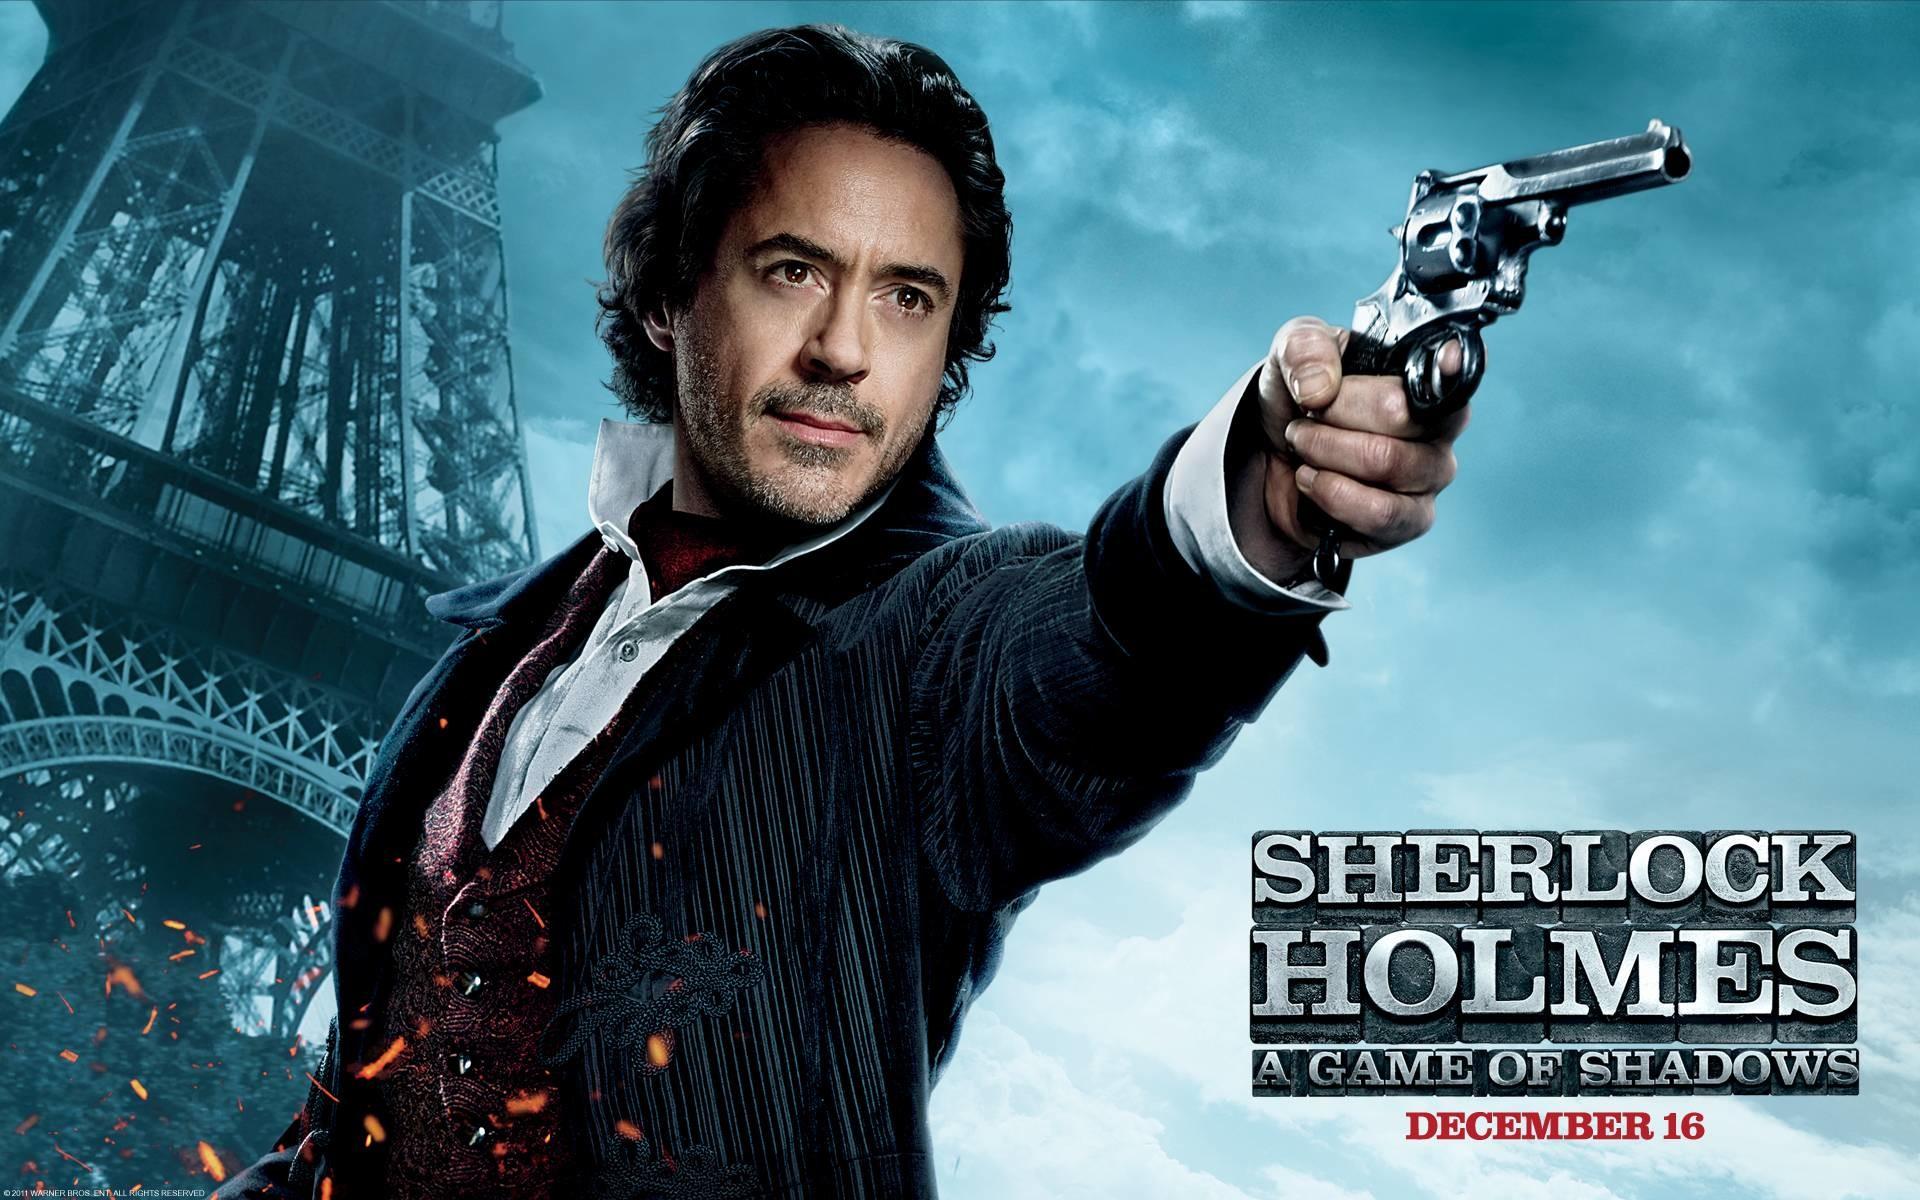 Robert Downey Jr Sherlock Holmes Wallpaper ①